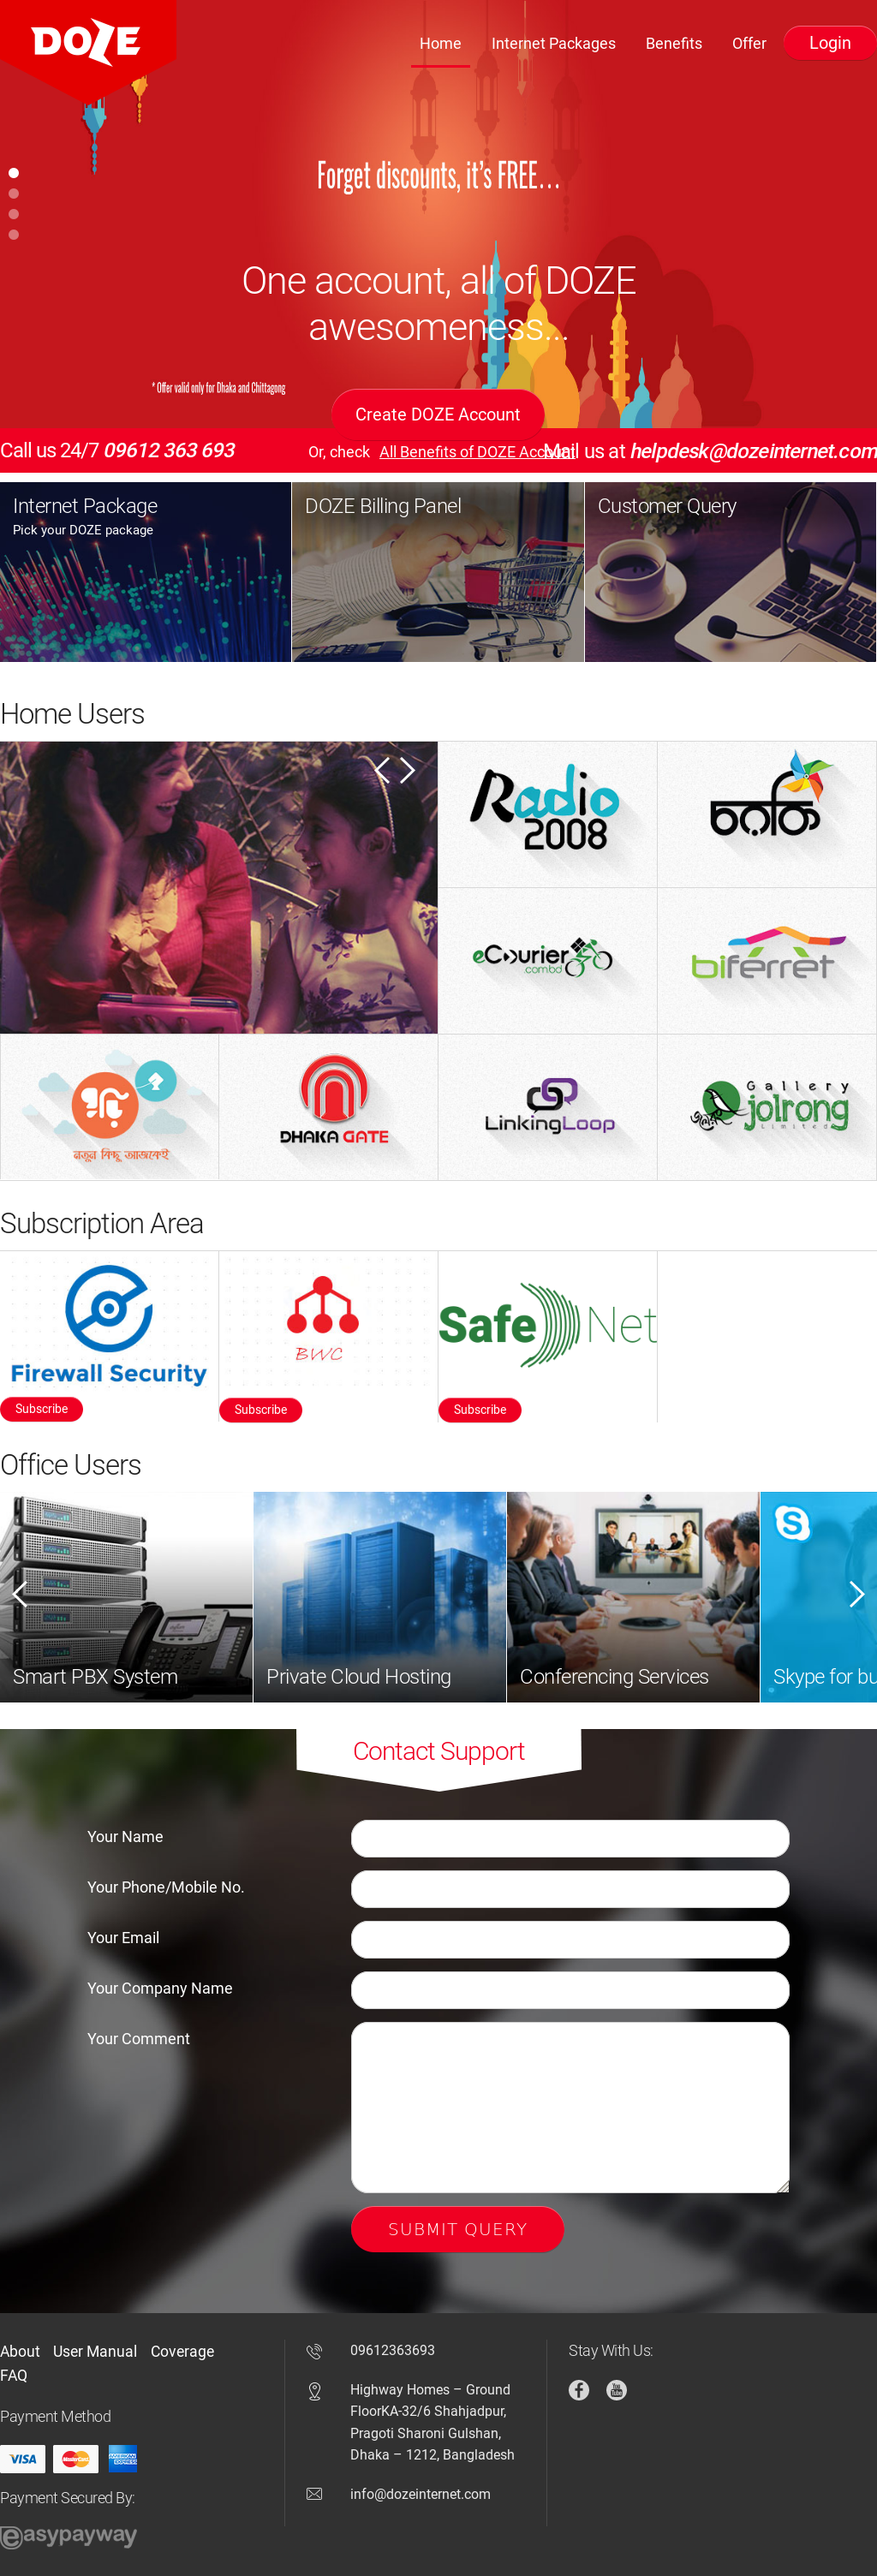 Doze Internet Competitors, Revenue and Employees - Owler Company Profile